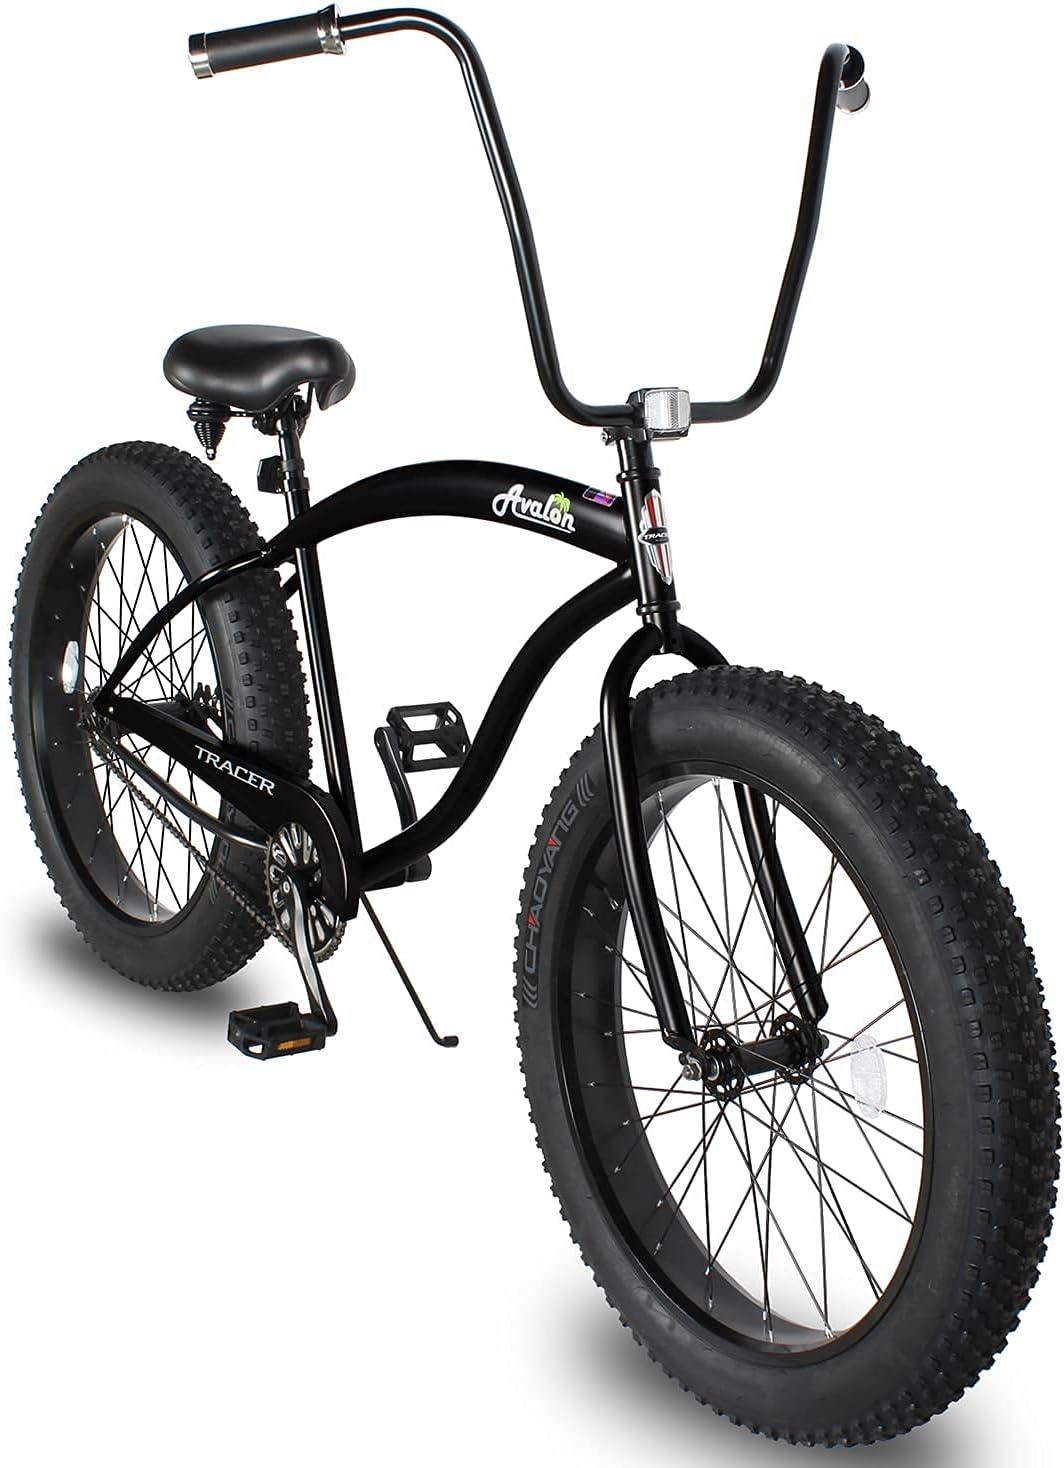 Tracer Avalon 26 Inch Beach Cruiser Bike